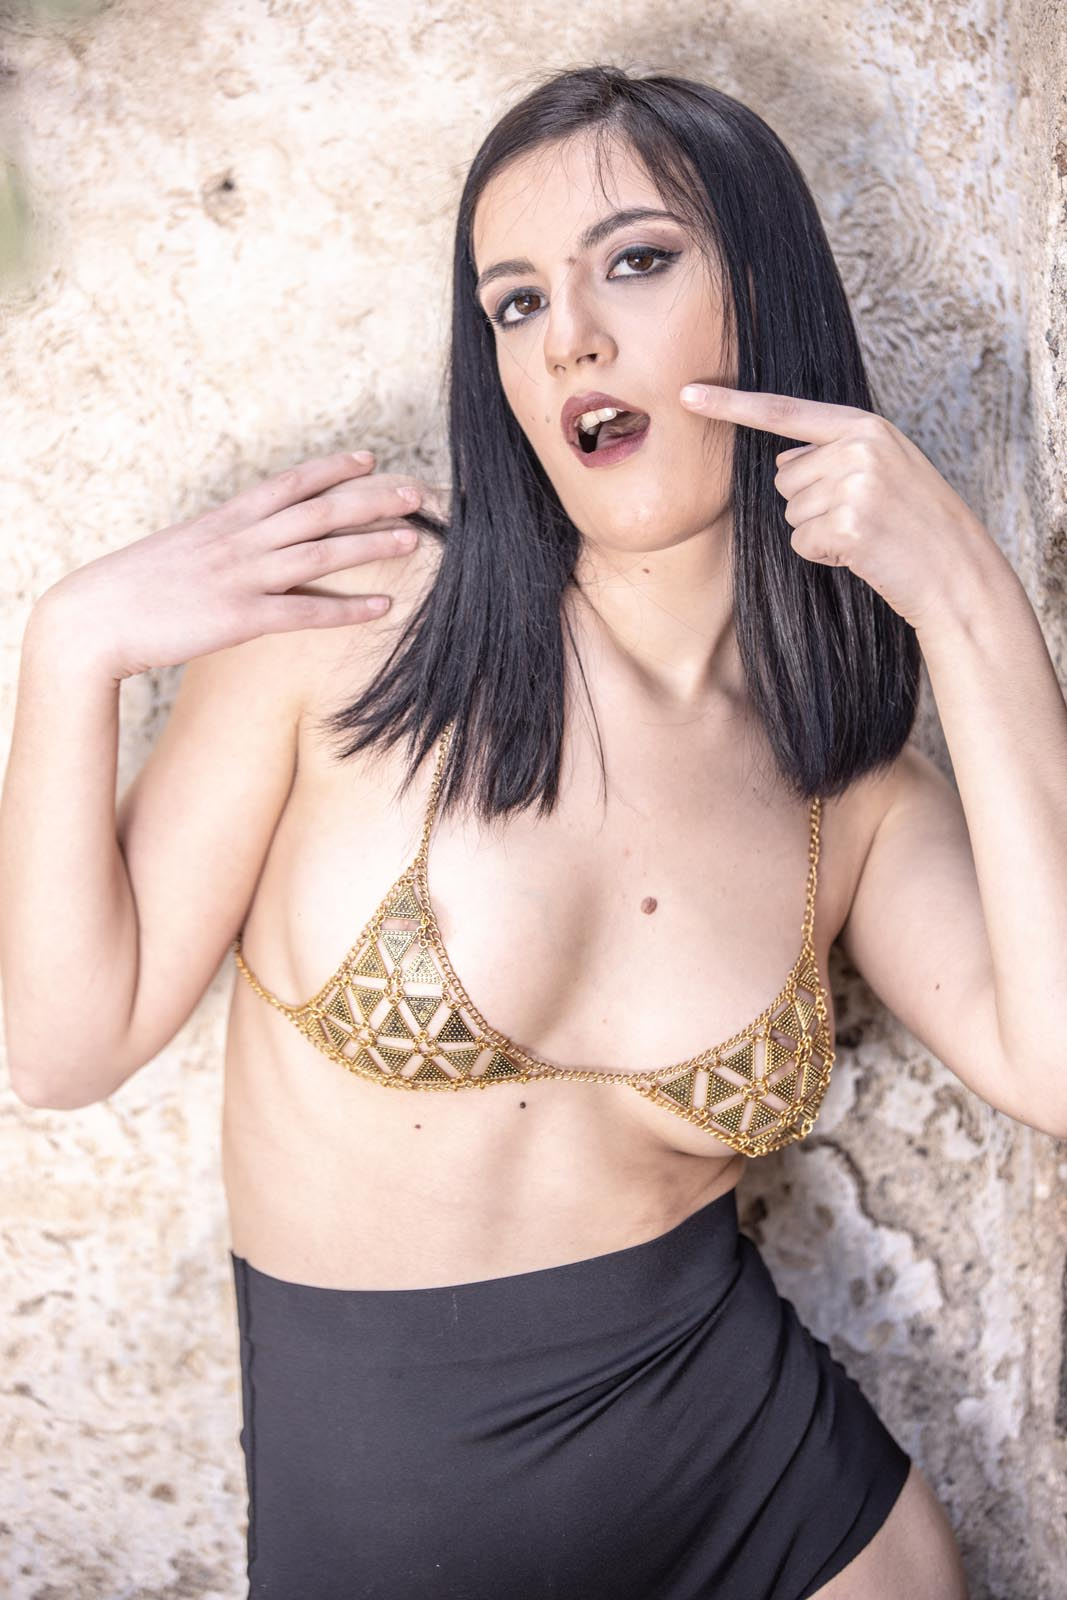 Marica_nudeart_Messina3